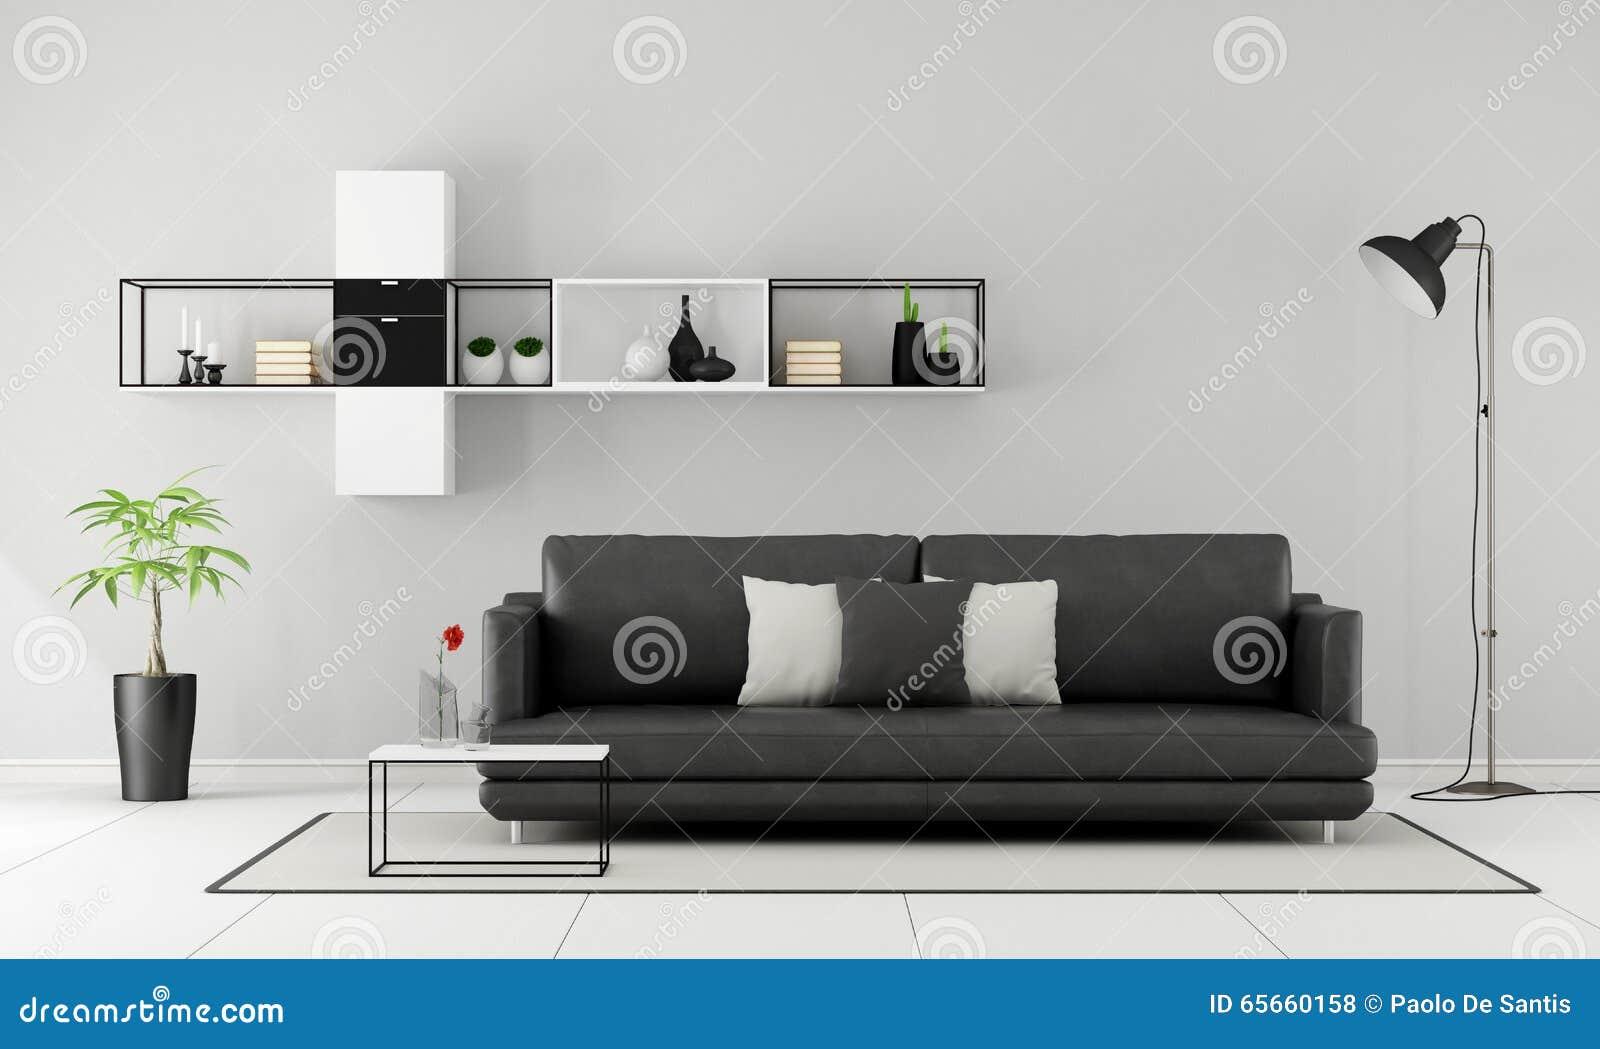 Black And White Minimalist Lounge Stock Illustration - Illustration ...